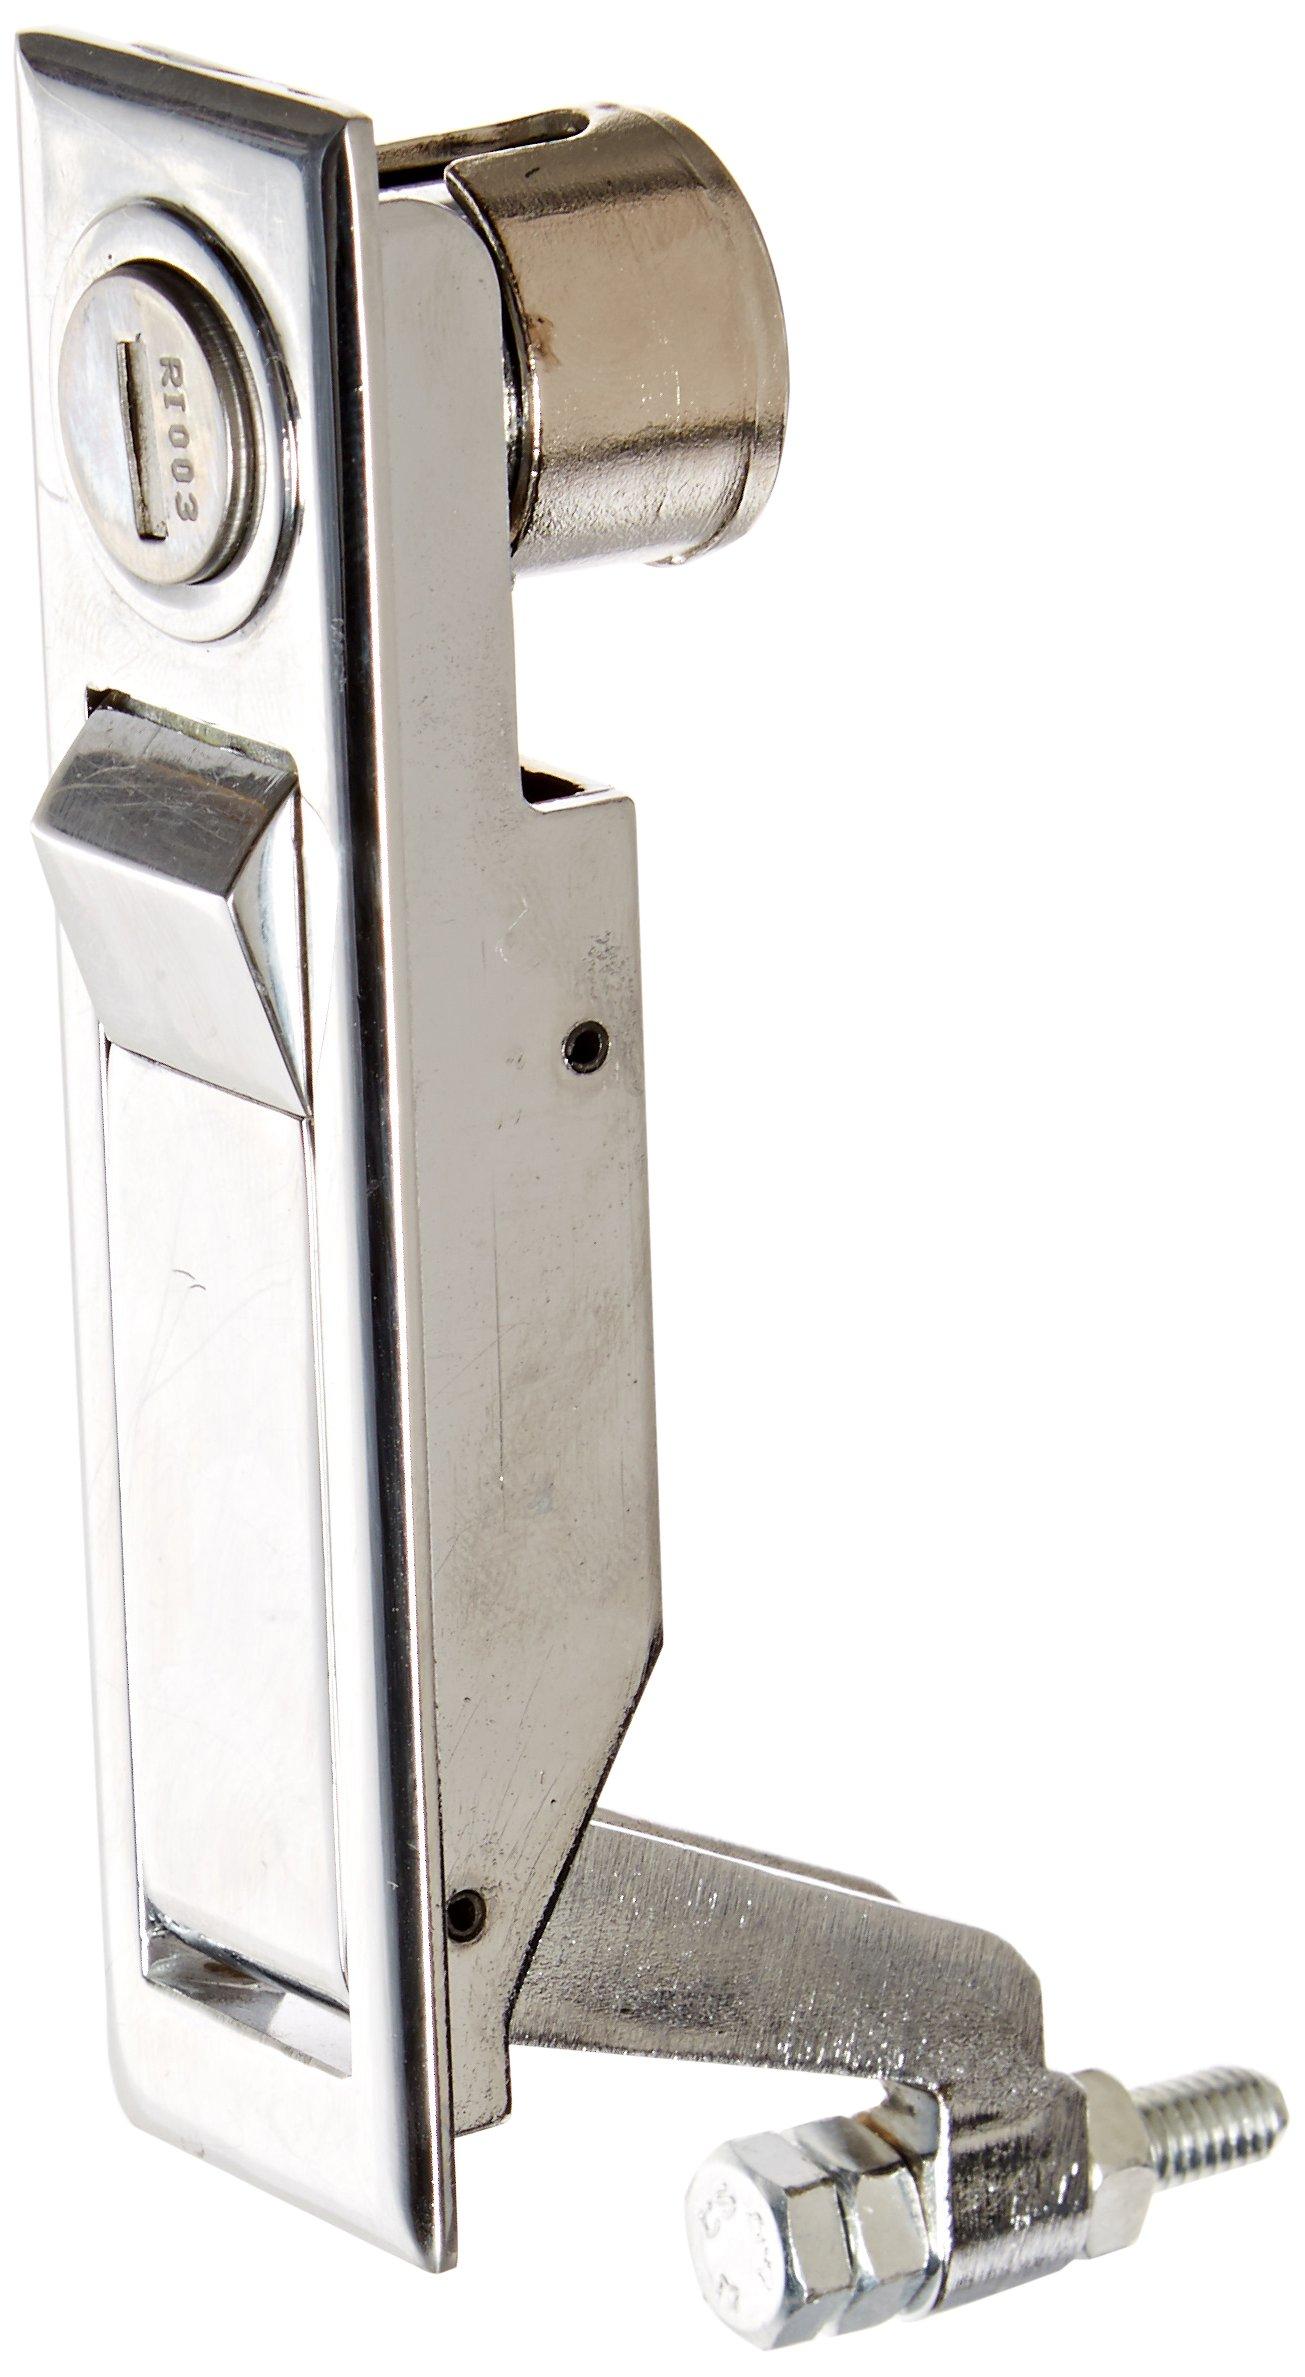 Sandusky Lee TLH-C Recessed Push Button Locking Handle, Chrome